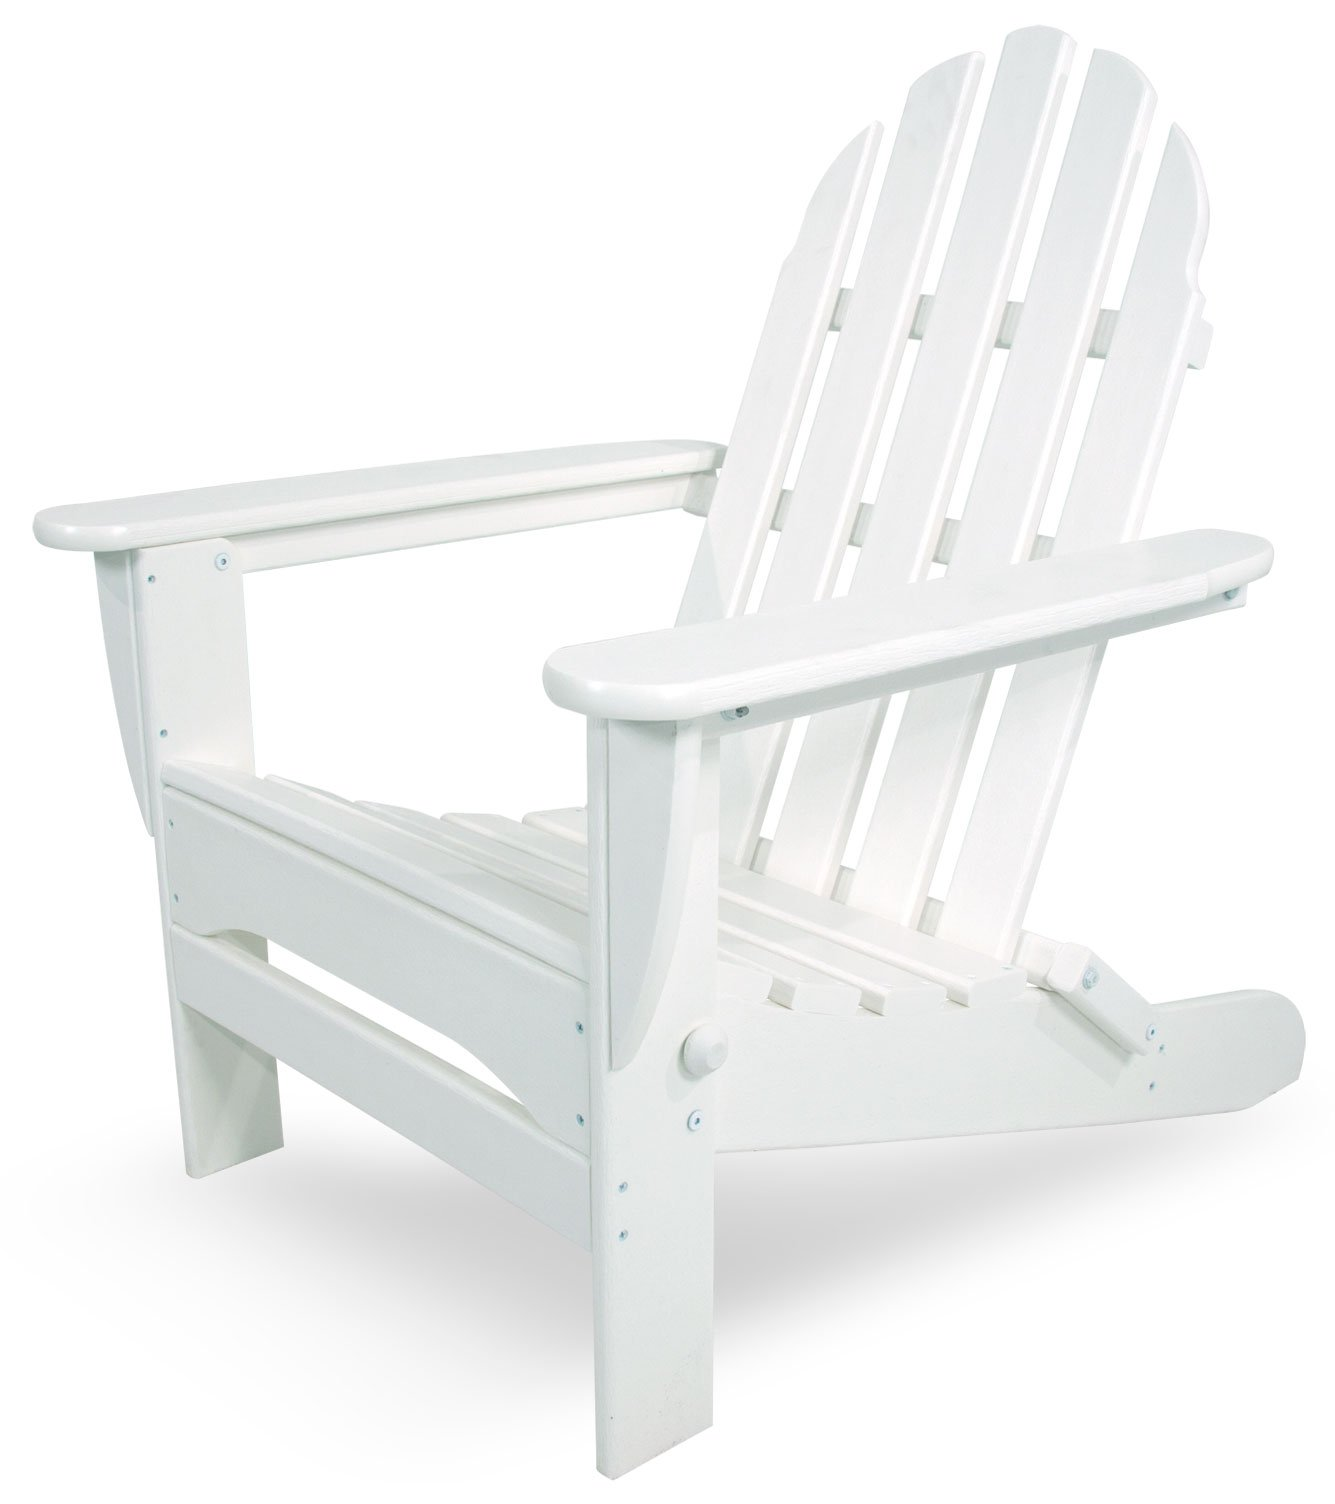 POLYWOOD AD5030WH Classic Folding Adirondack Chair, 35.00'' x 29'' x 35.00'', White by POLYWOOD